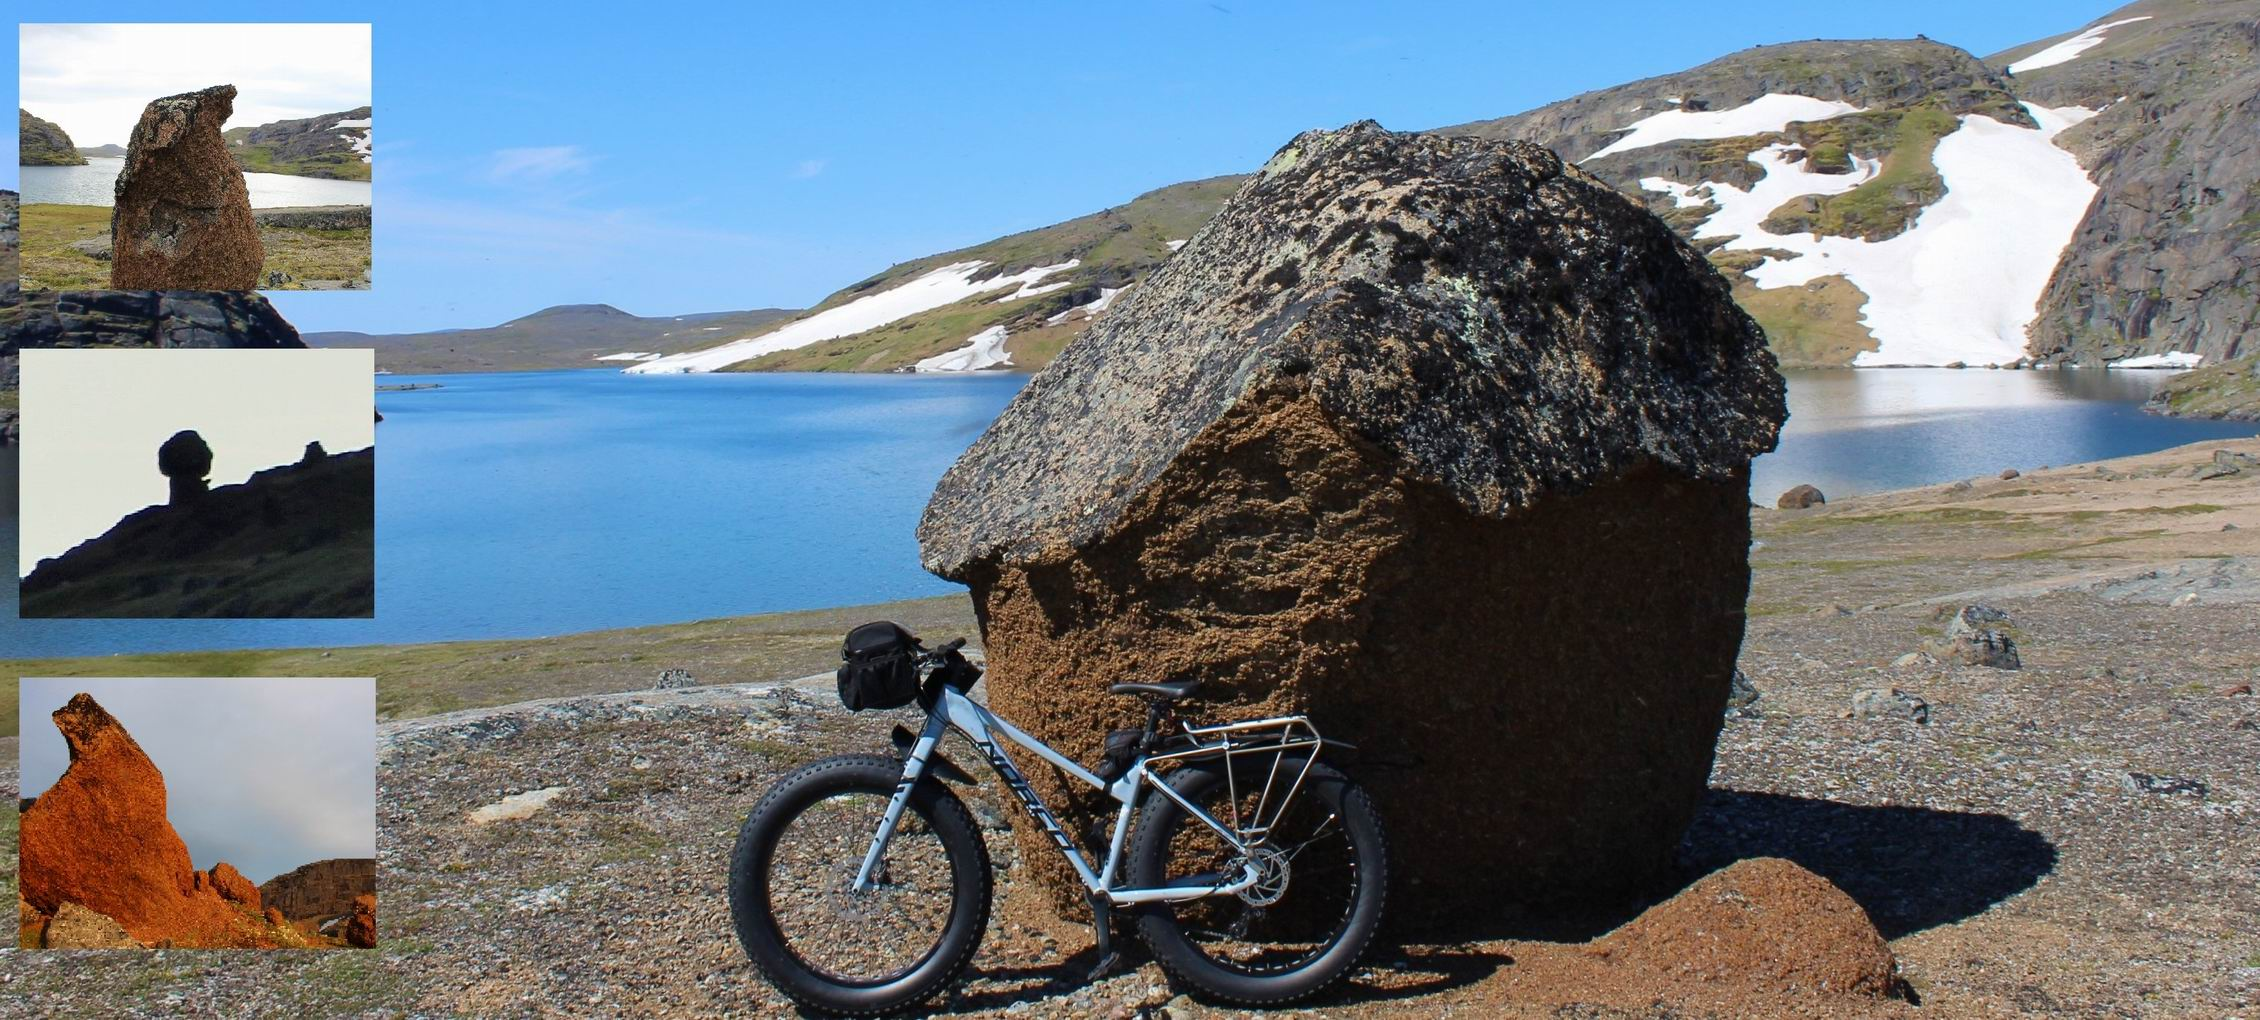 Excursion to the Secret Garden of the Monoliths in Labrador